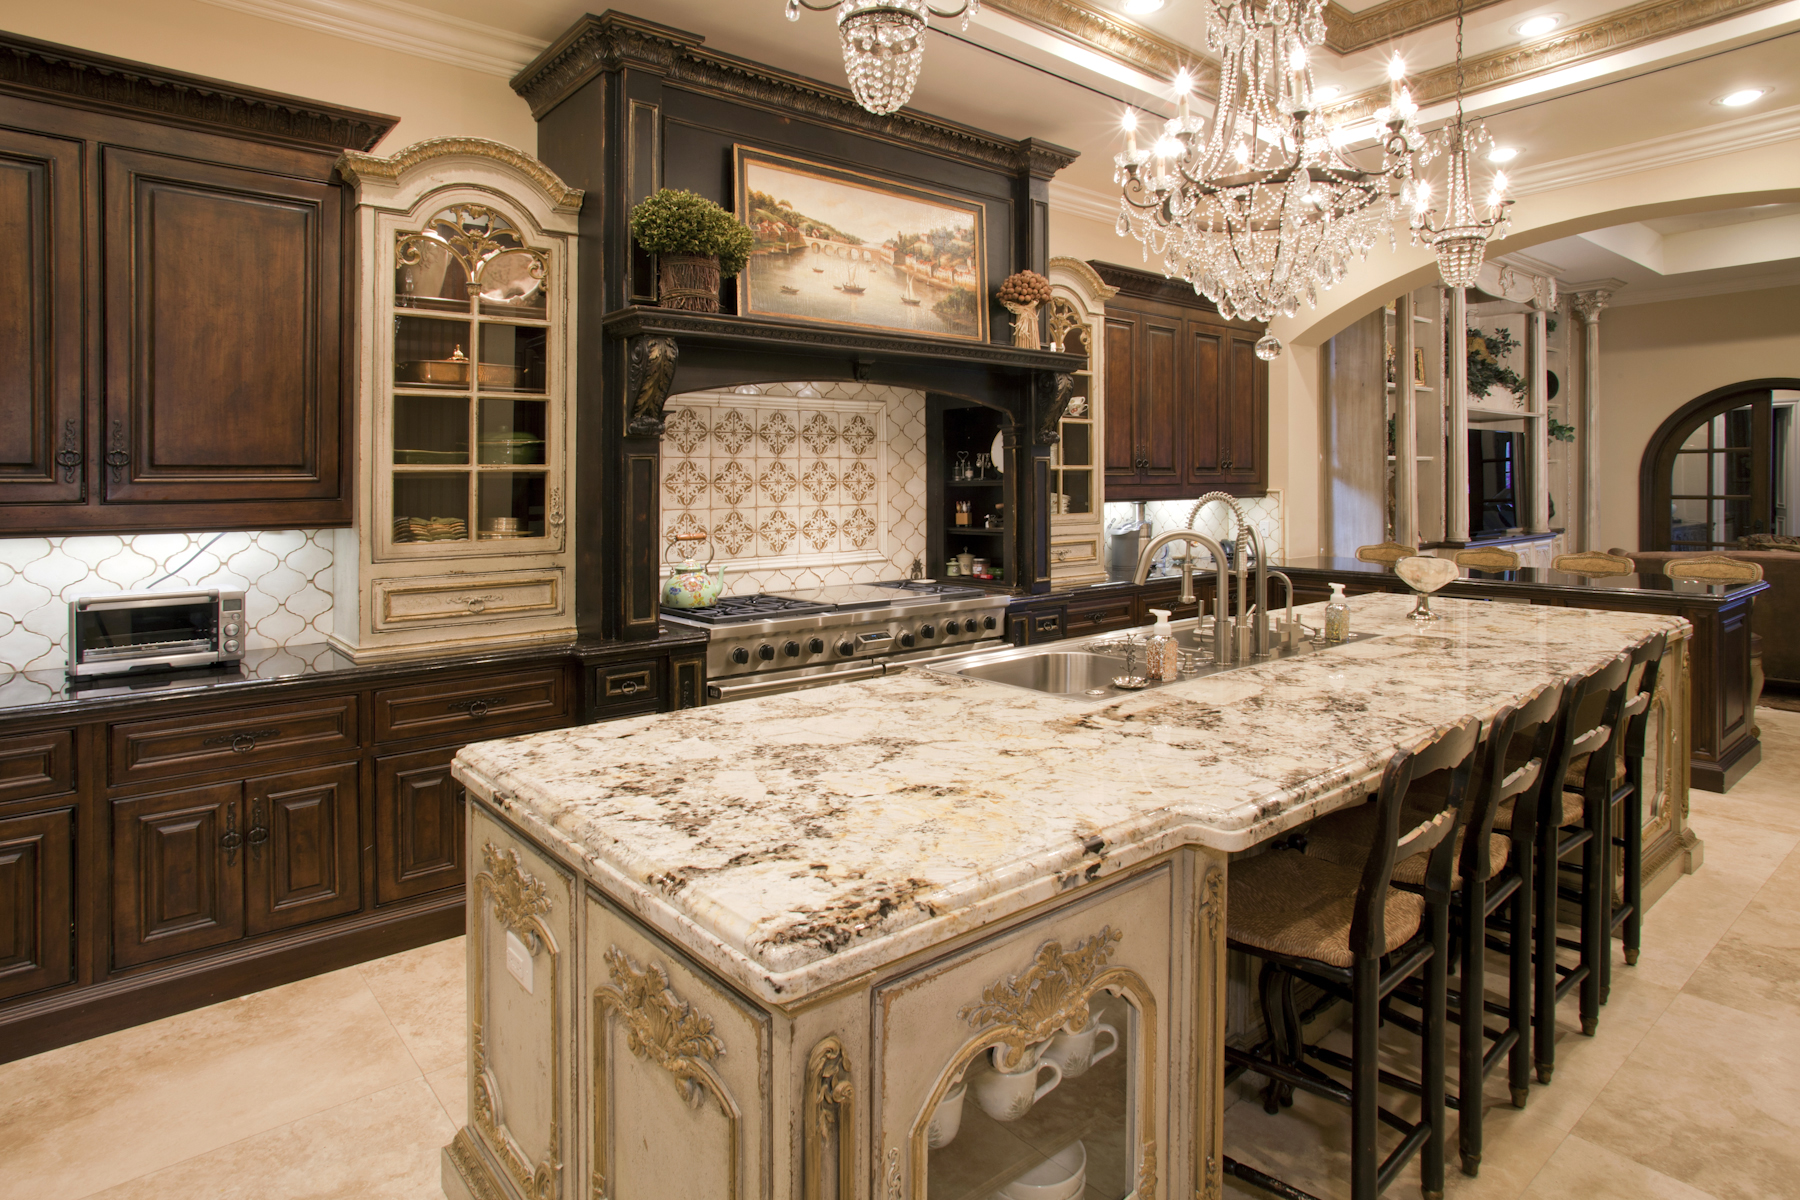 Old world craftsmanship throughout this kitchen